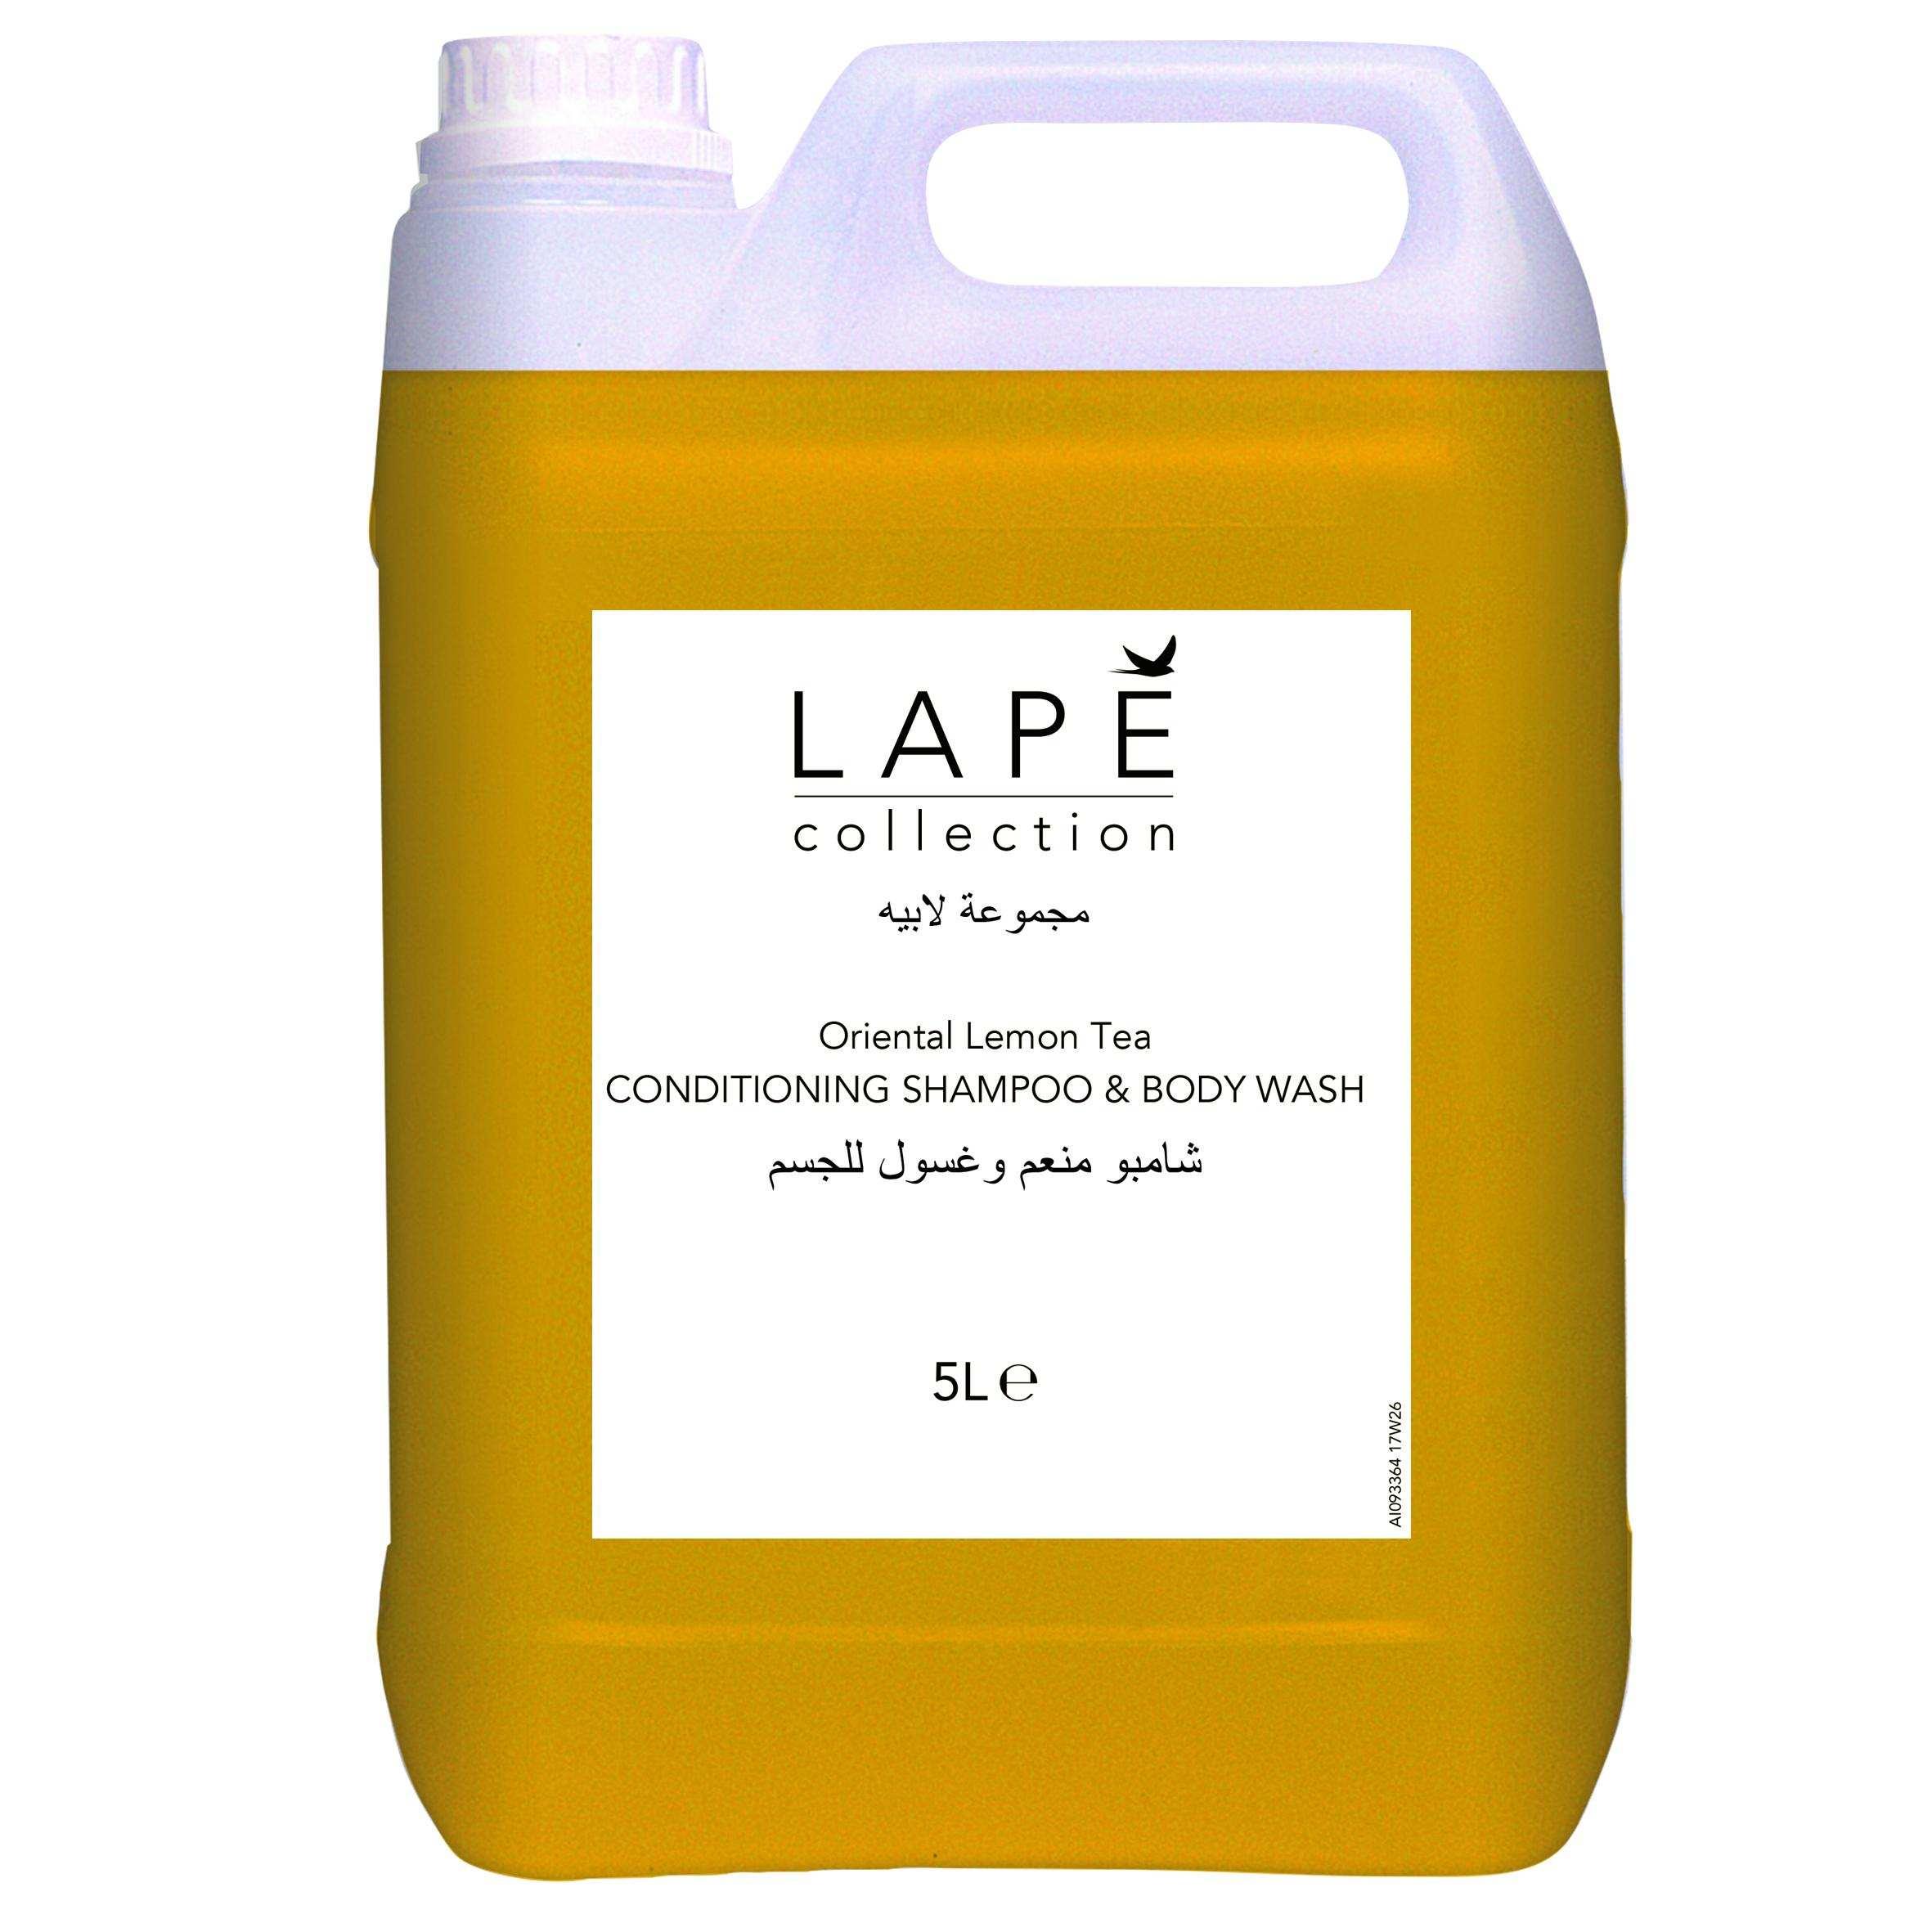 100977377-LAPE-Collection-5L-refill-Conditining-Shampoo-5L-CMKY-20x20cm.jpg